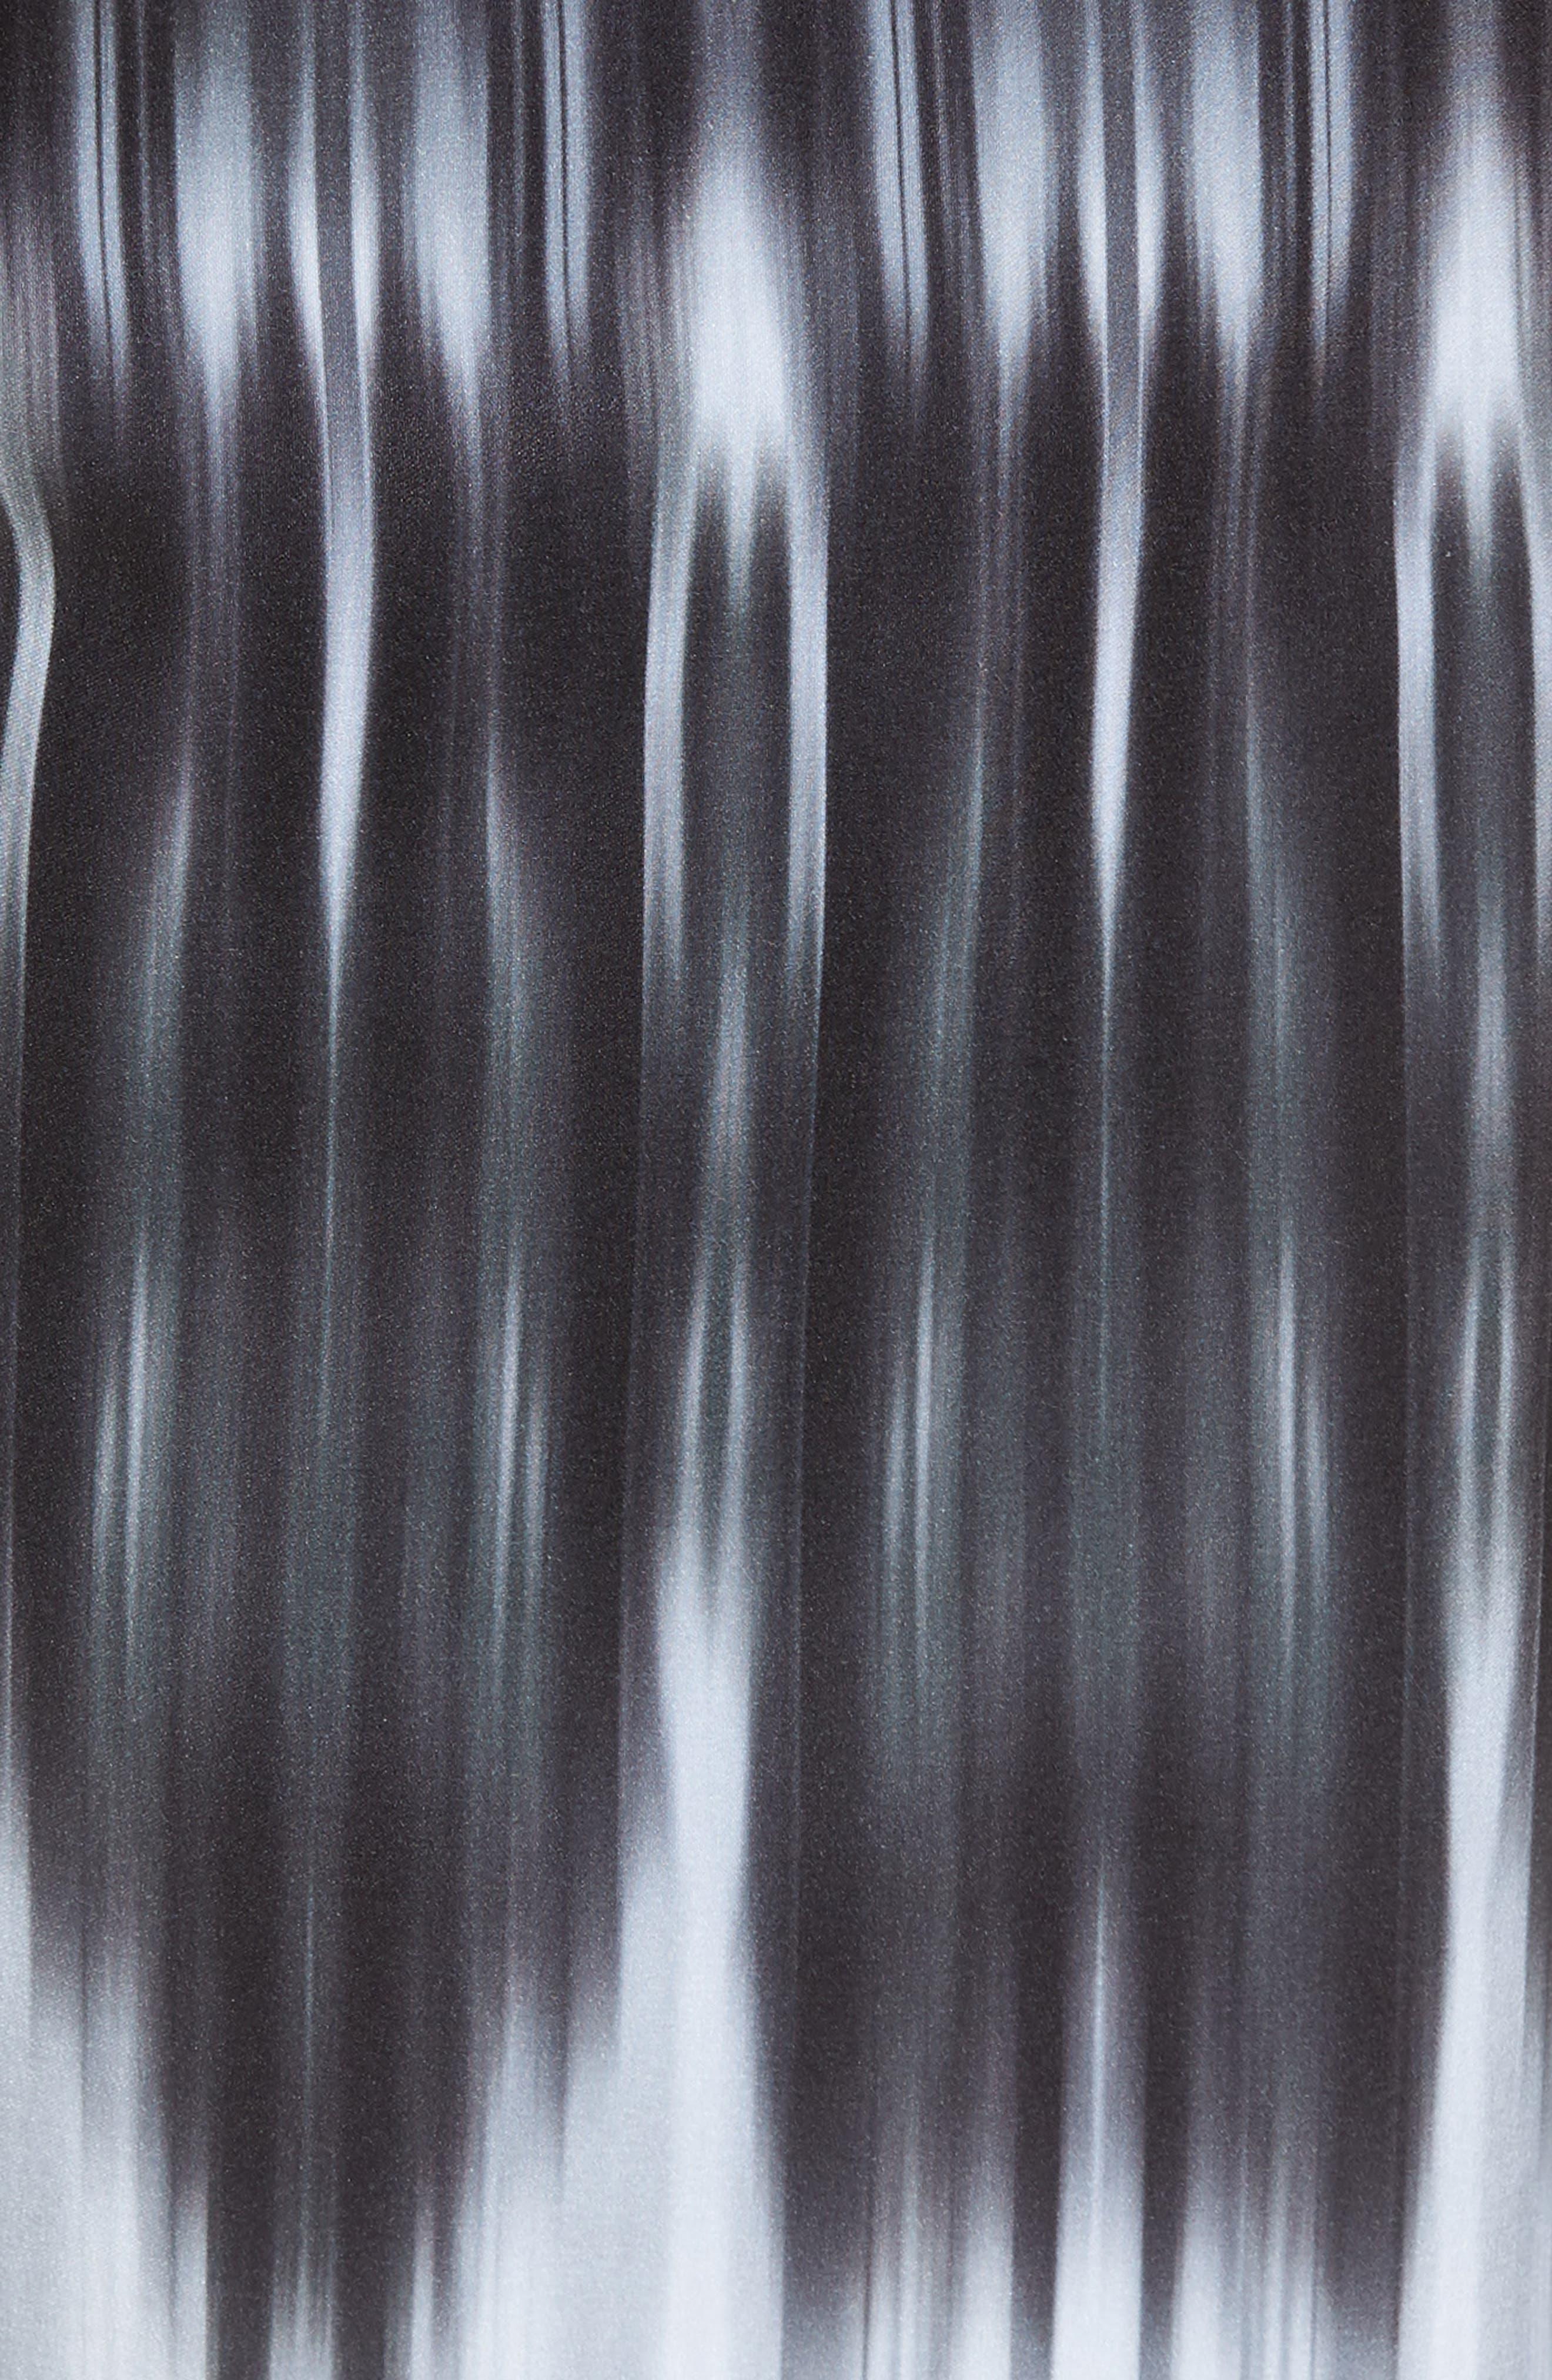 Superfreak Dimension Board Shorts,                             Alternate thumbnail 5, color,                             Black